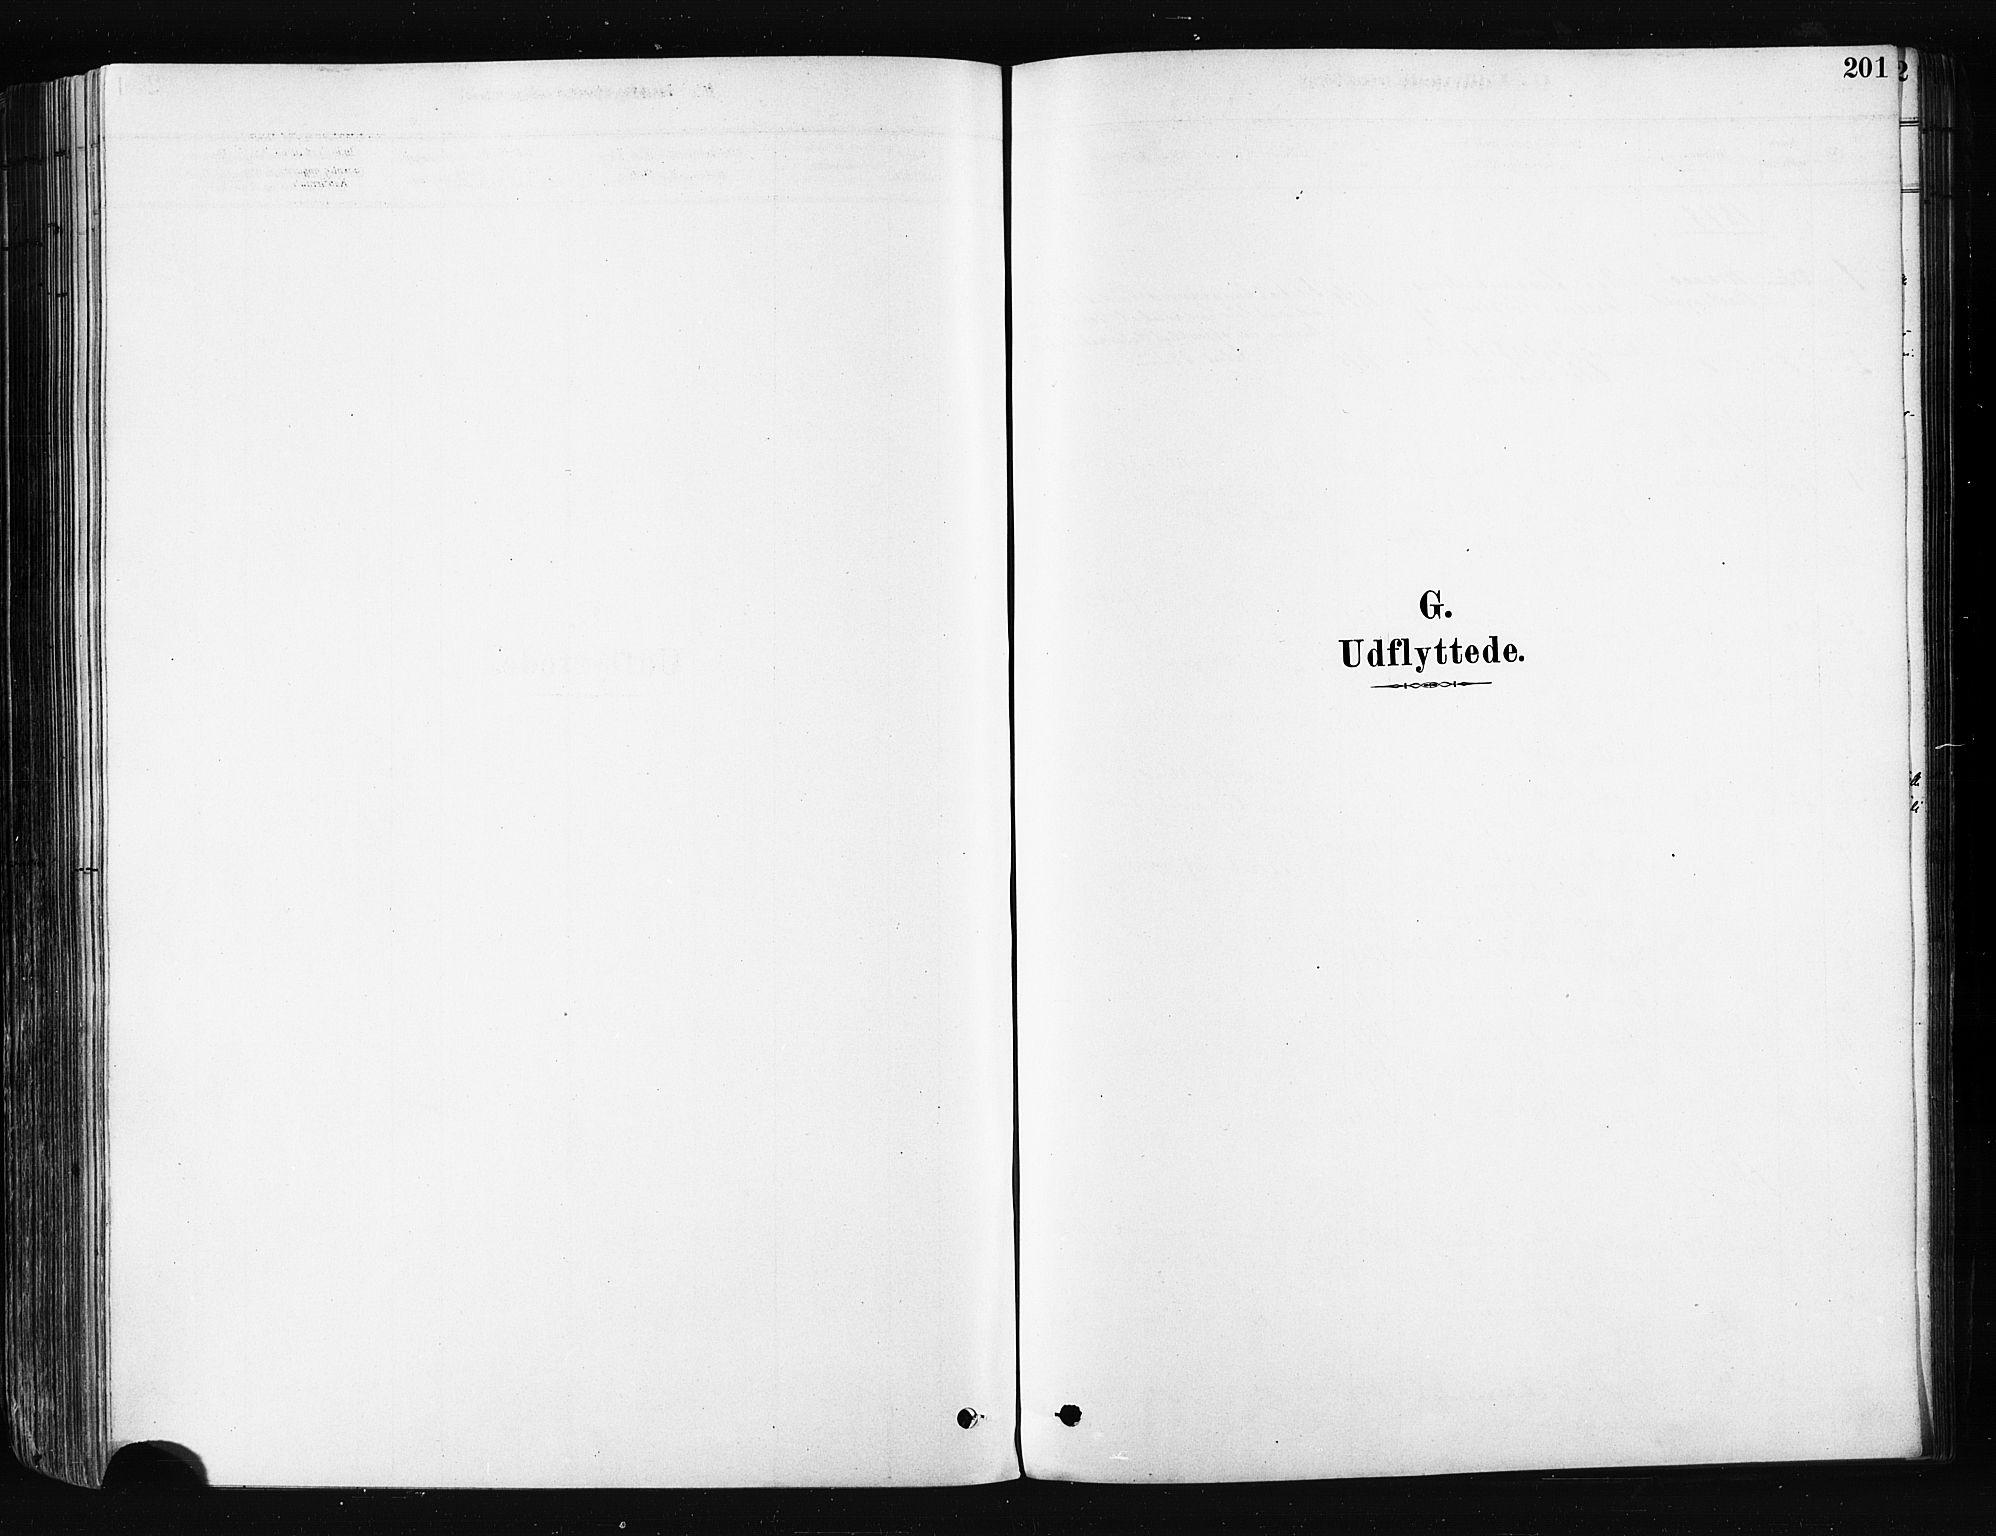 SATØ, Skjervøy sokneprestkontor, H/Ha/Haa/L0014kirke: Ministerialbok nr. 14, 1878-1894, s. 201